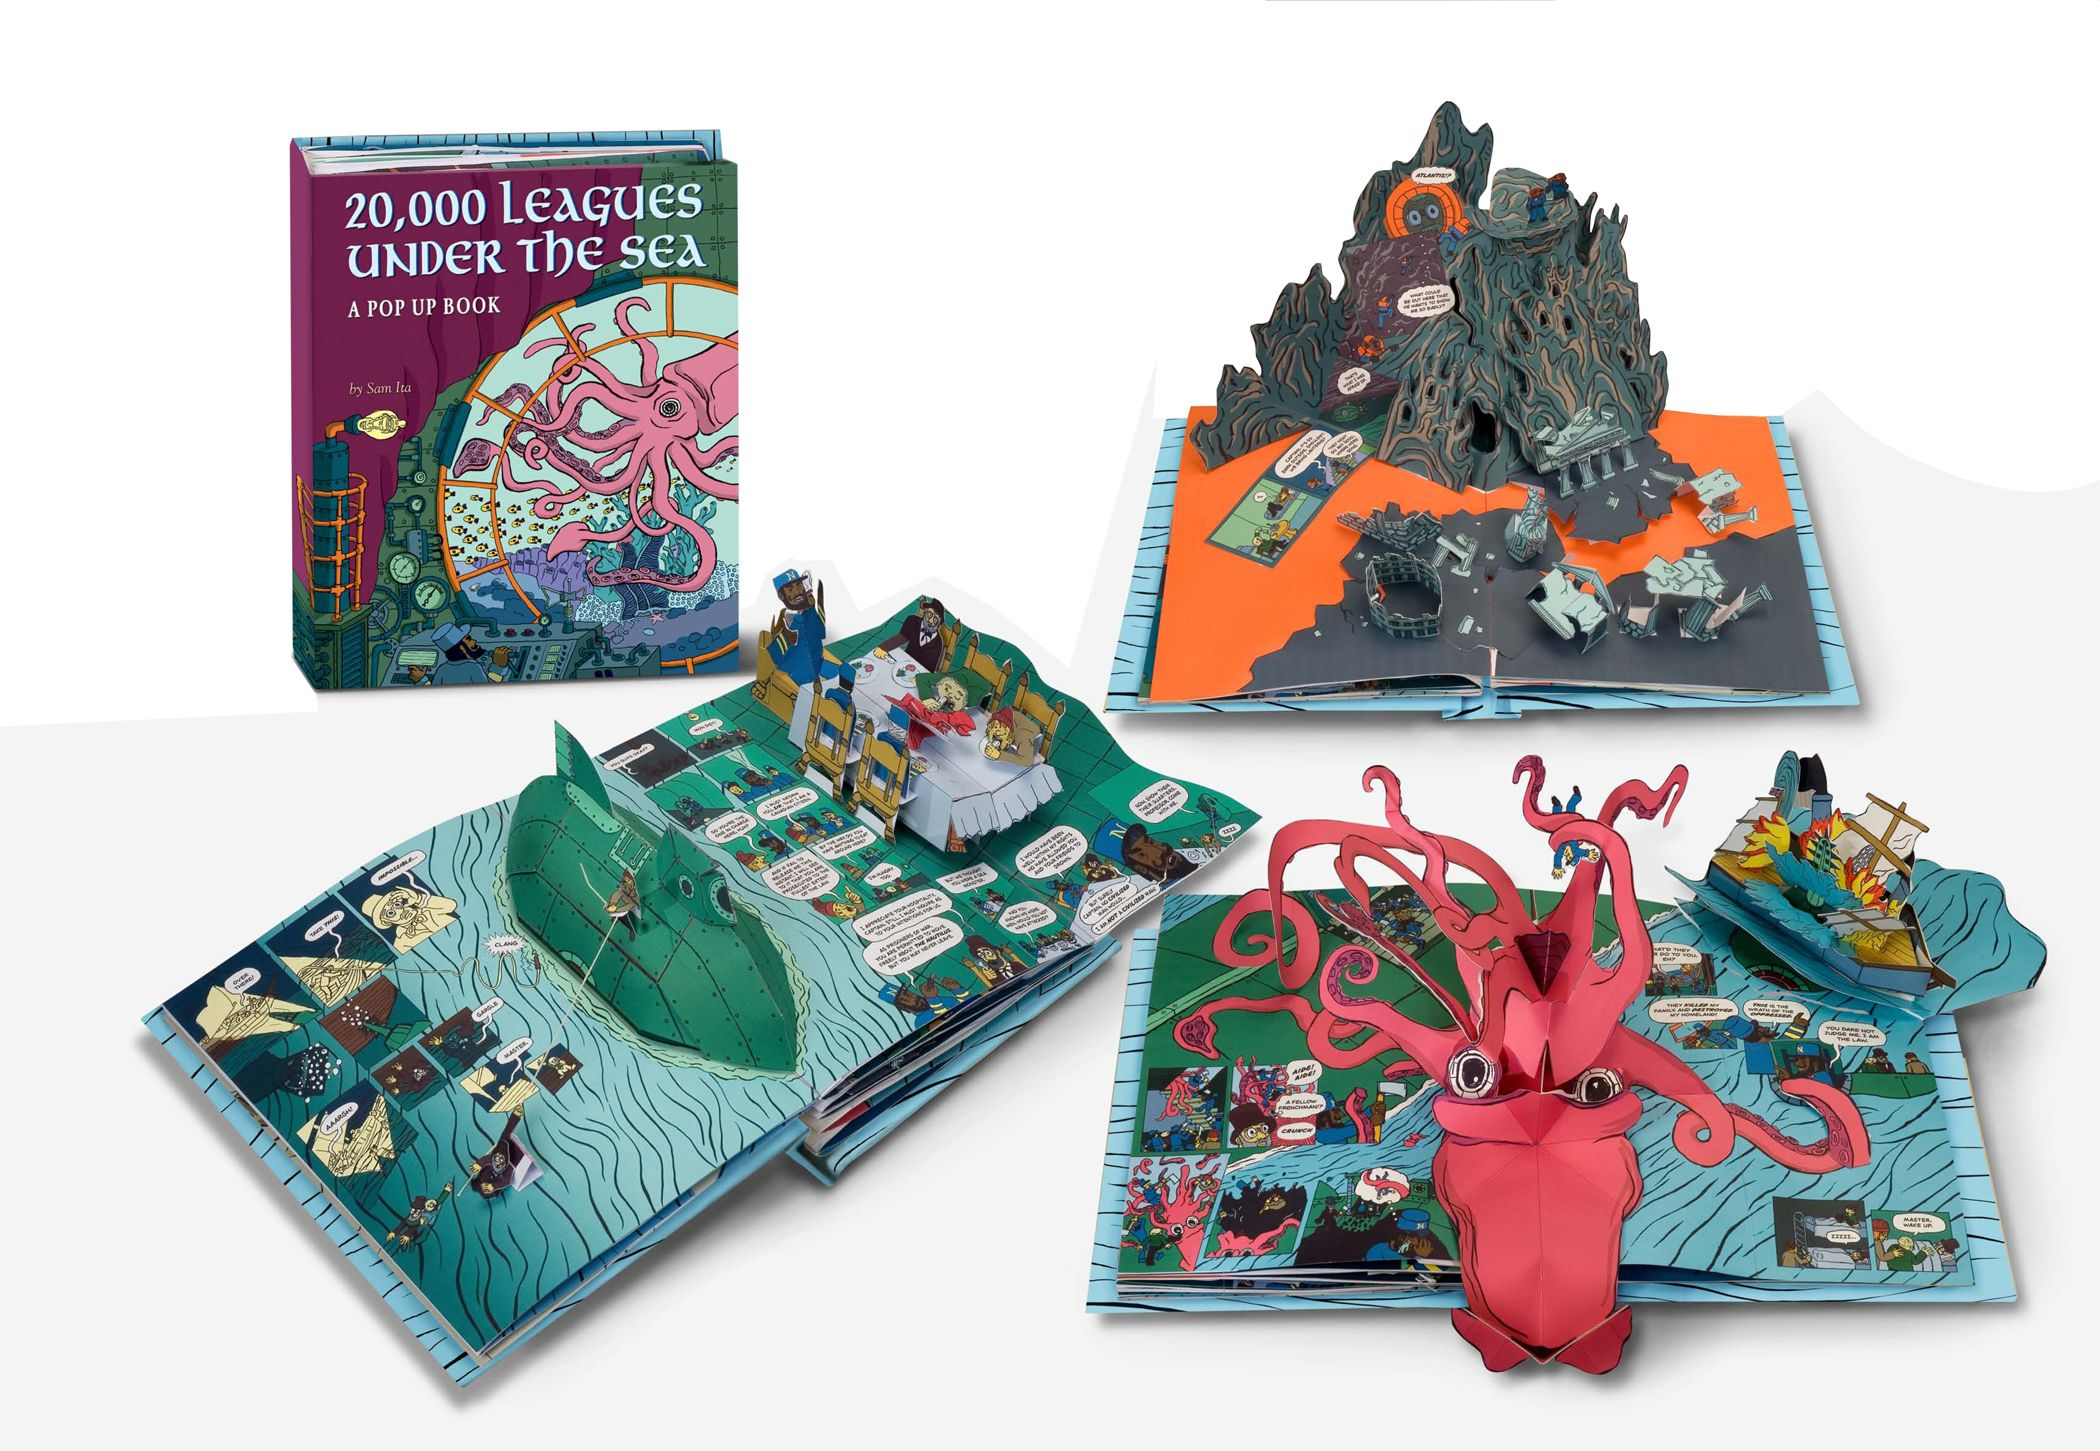 20 000 Leagues Under The Sea Pop Up Book Sam Ita Under The Sea Crafts Pop Up Book Diy Projects With Books